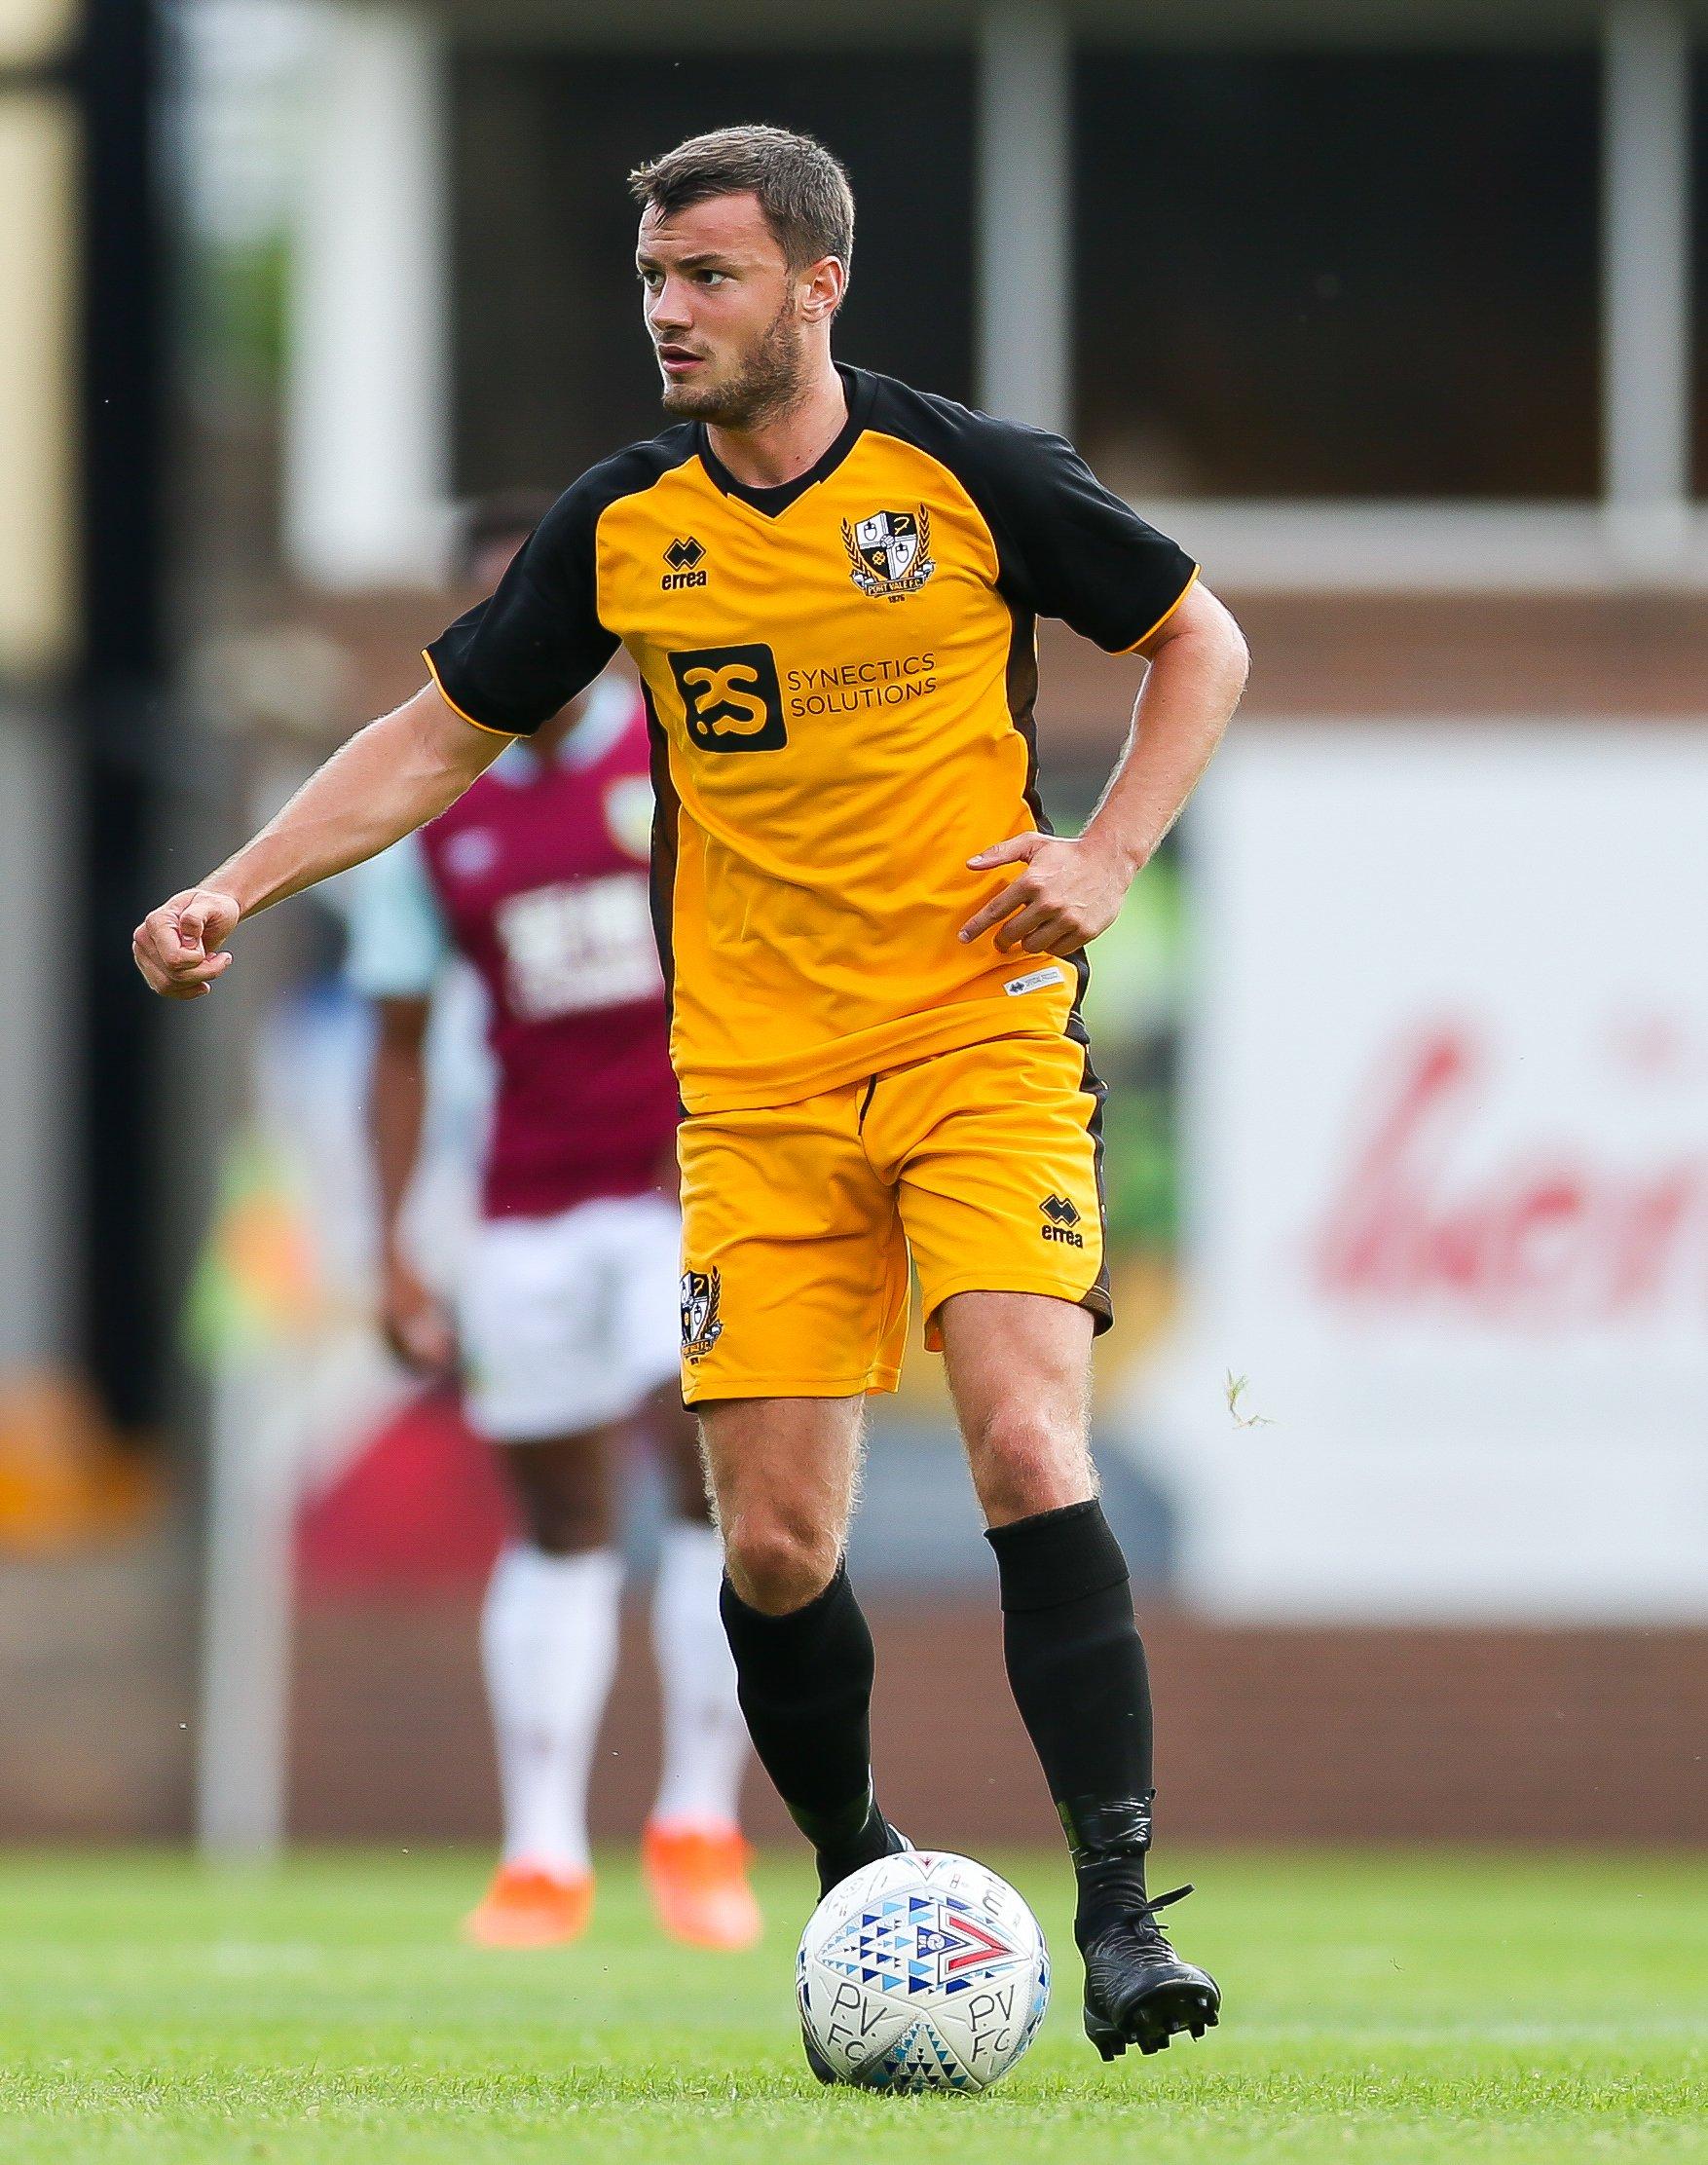 James Gibbons set to return from hamstring injury for Port Vale